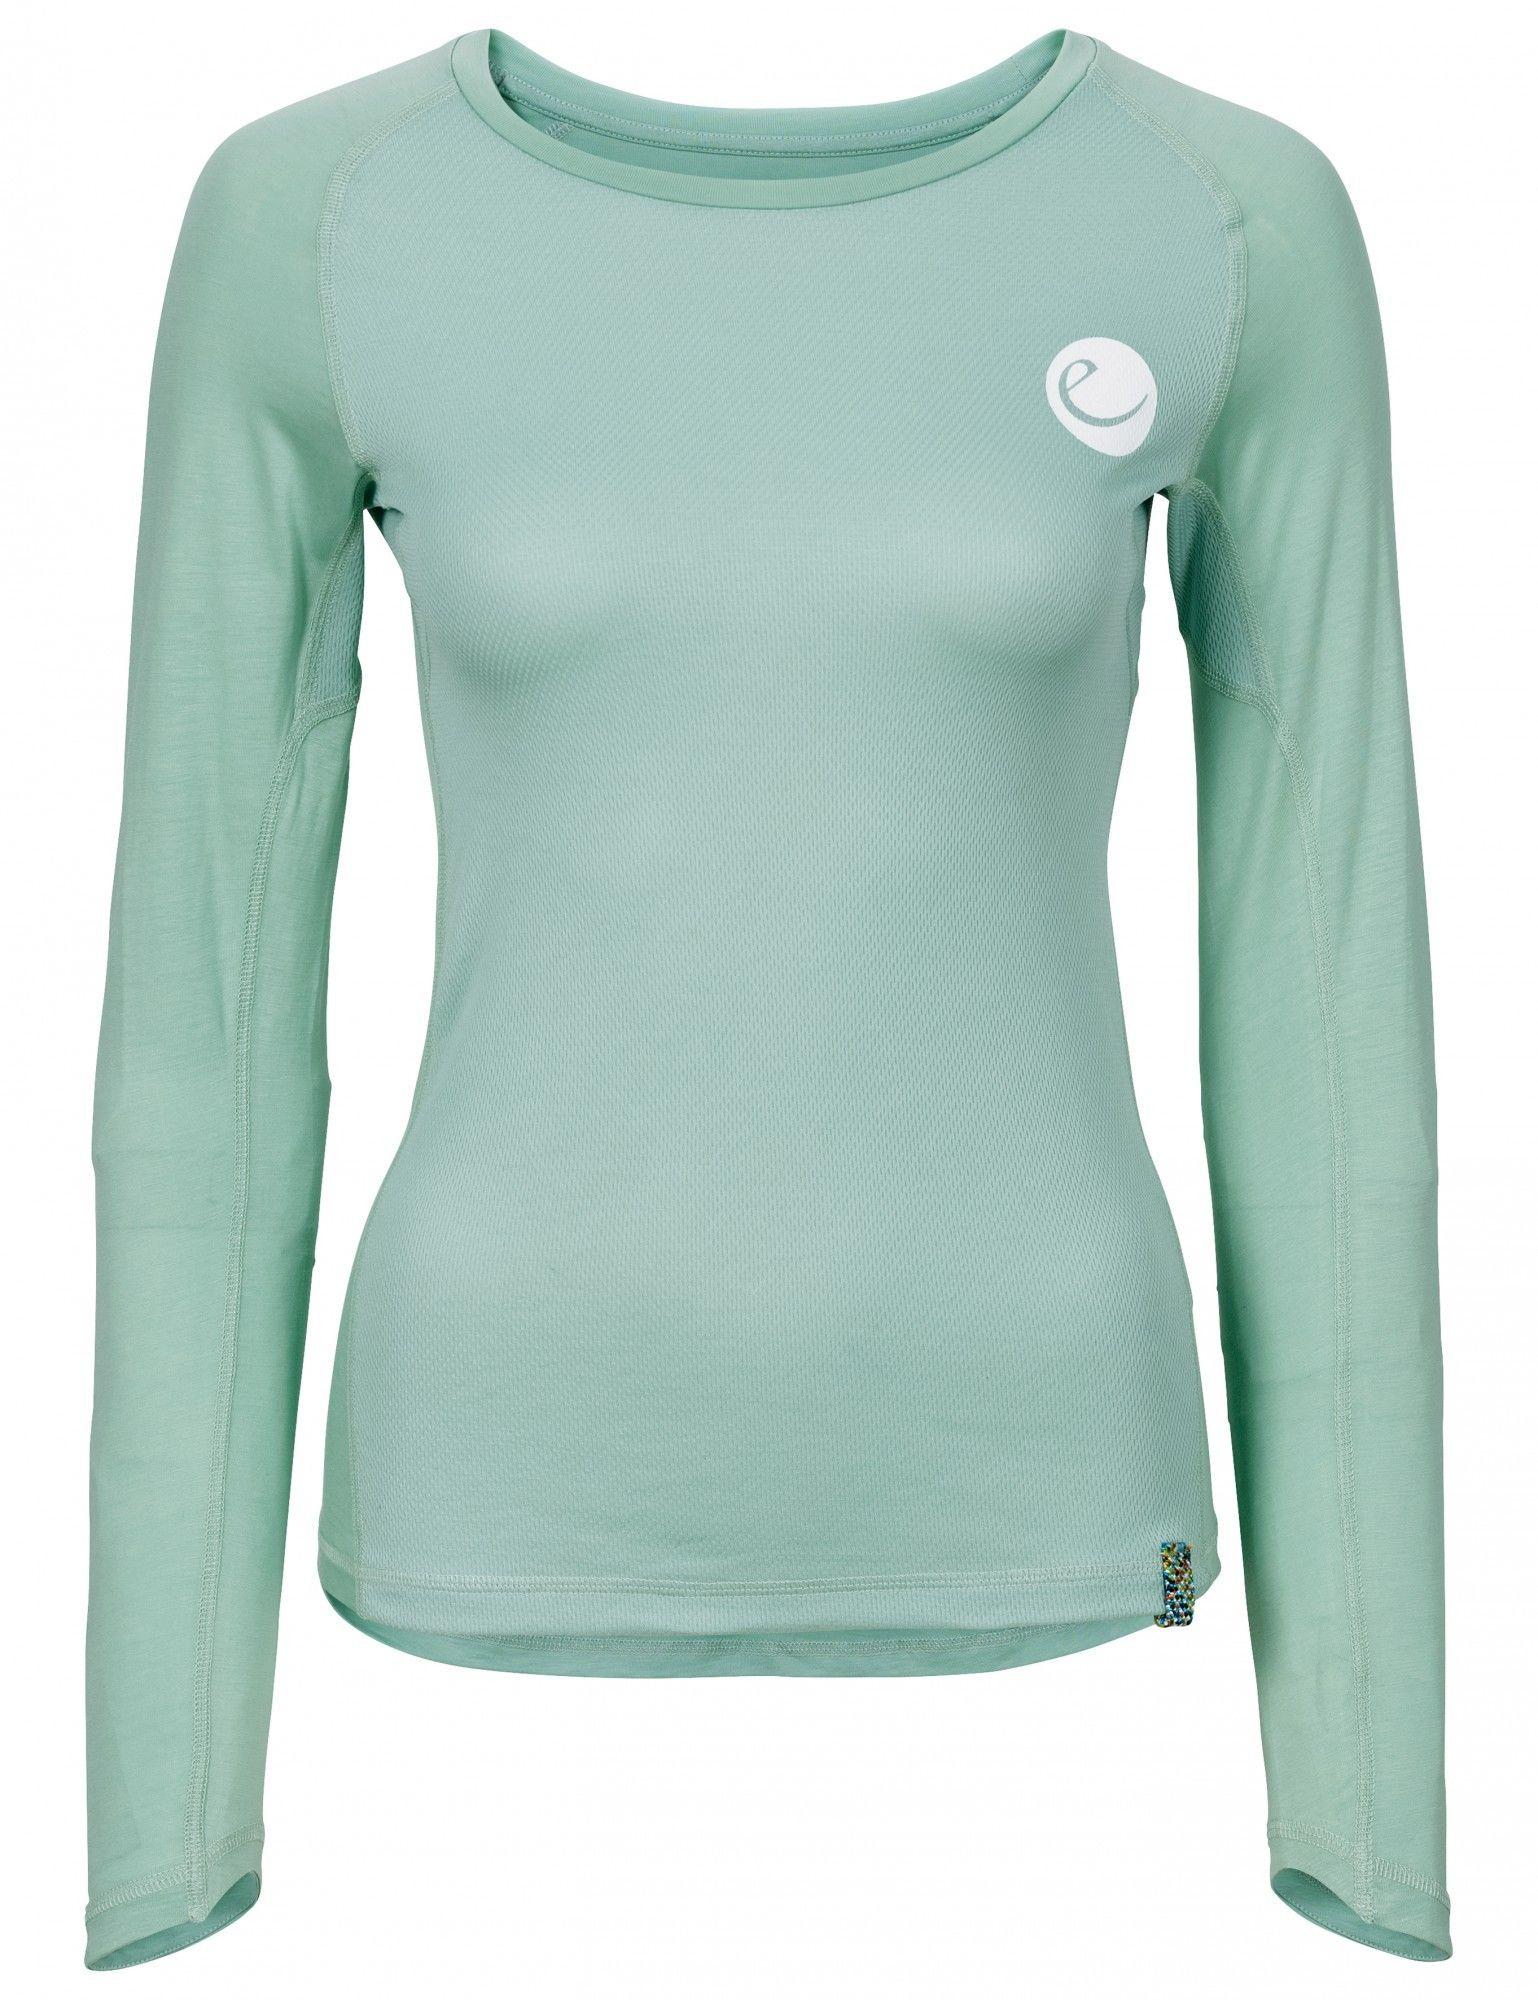 Edelrid W Ascender Long-Sleeve | Größe L - 40,XL - 42 | Damen Langarm-Shirt